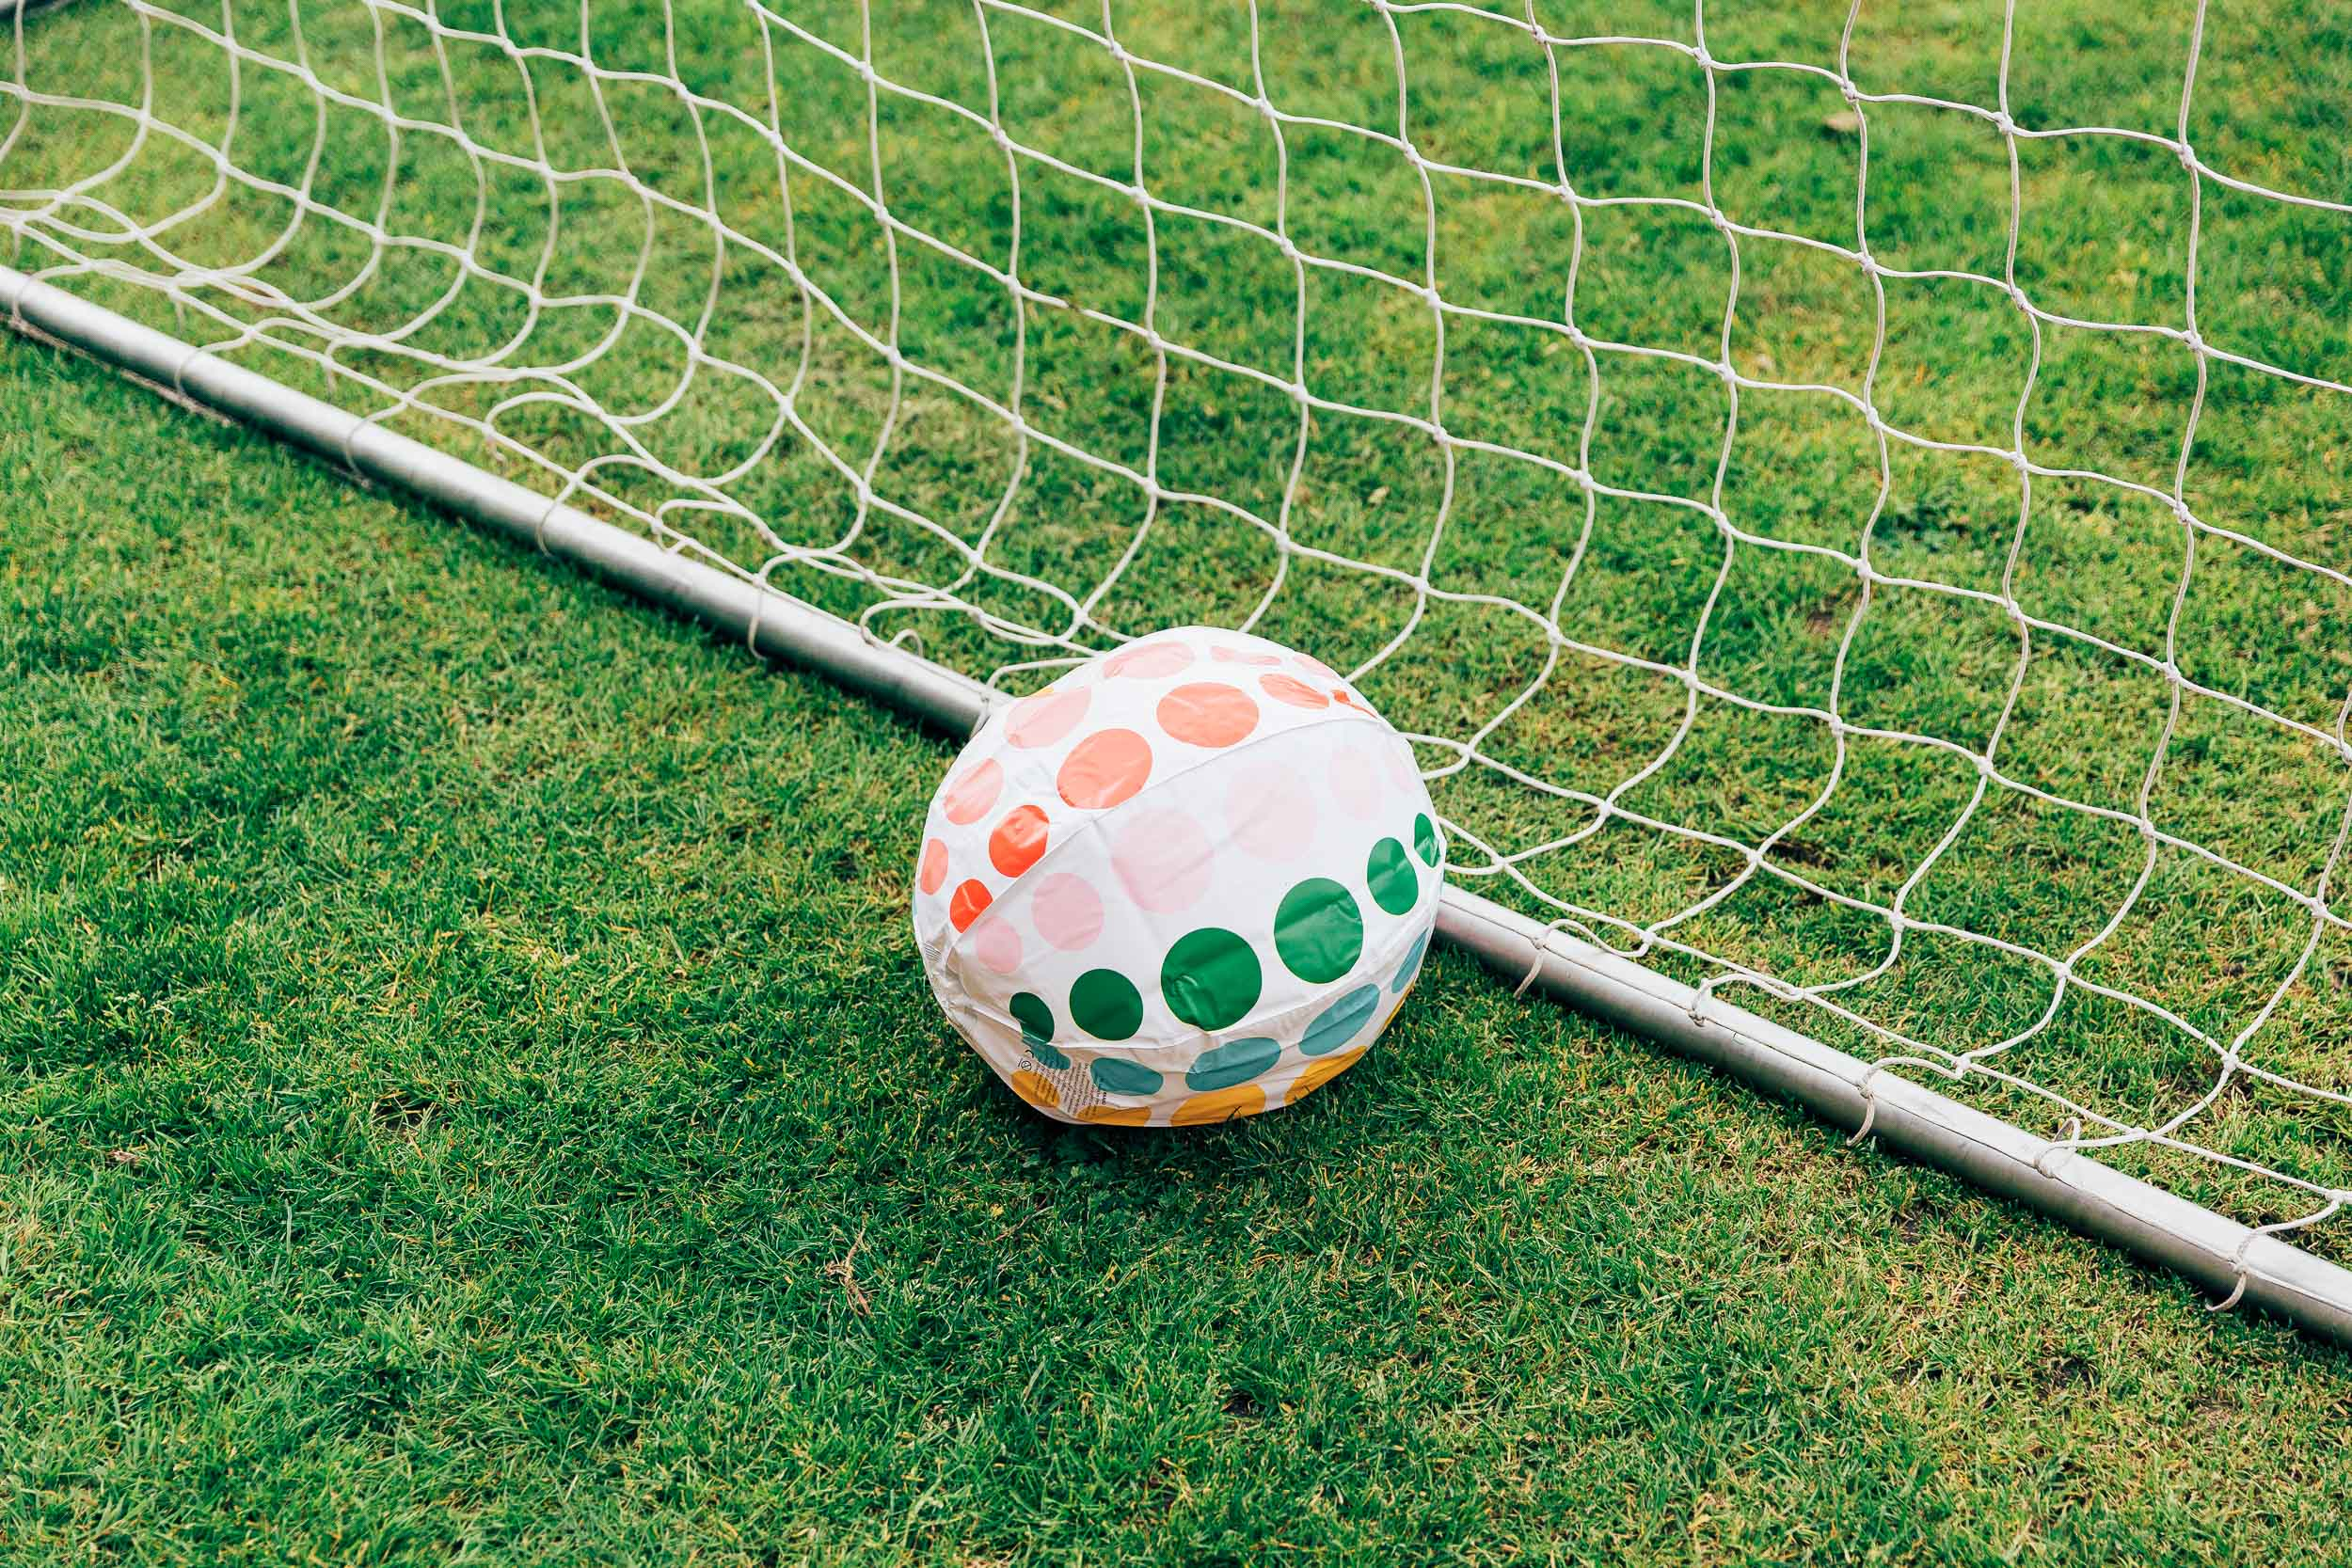 06_05_2019_Bromsgrove_Sporting_Corby-91.jpg